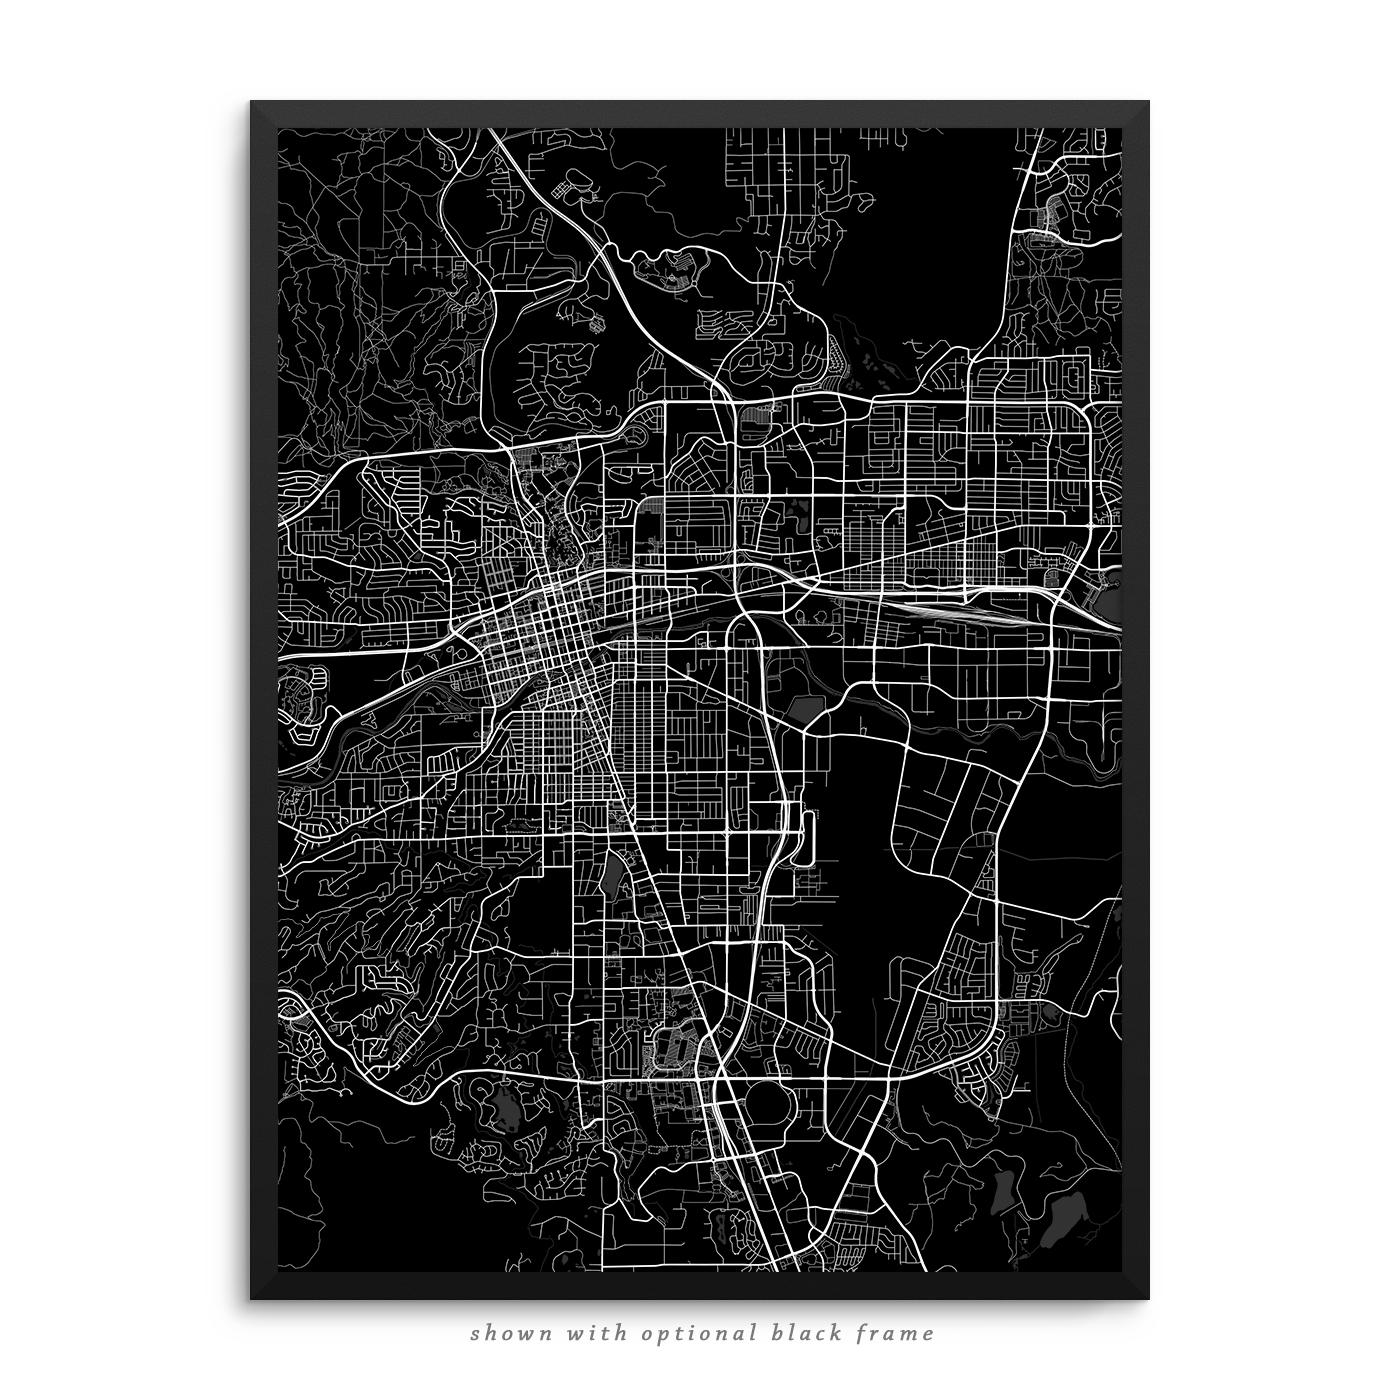 Reno Nevada Poster City Map Decor - Street map of reno nv